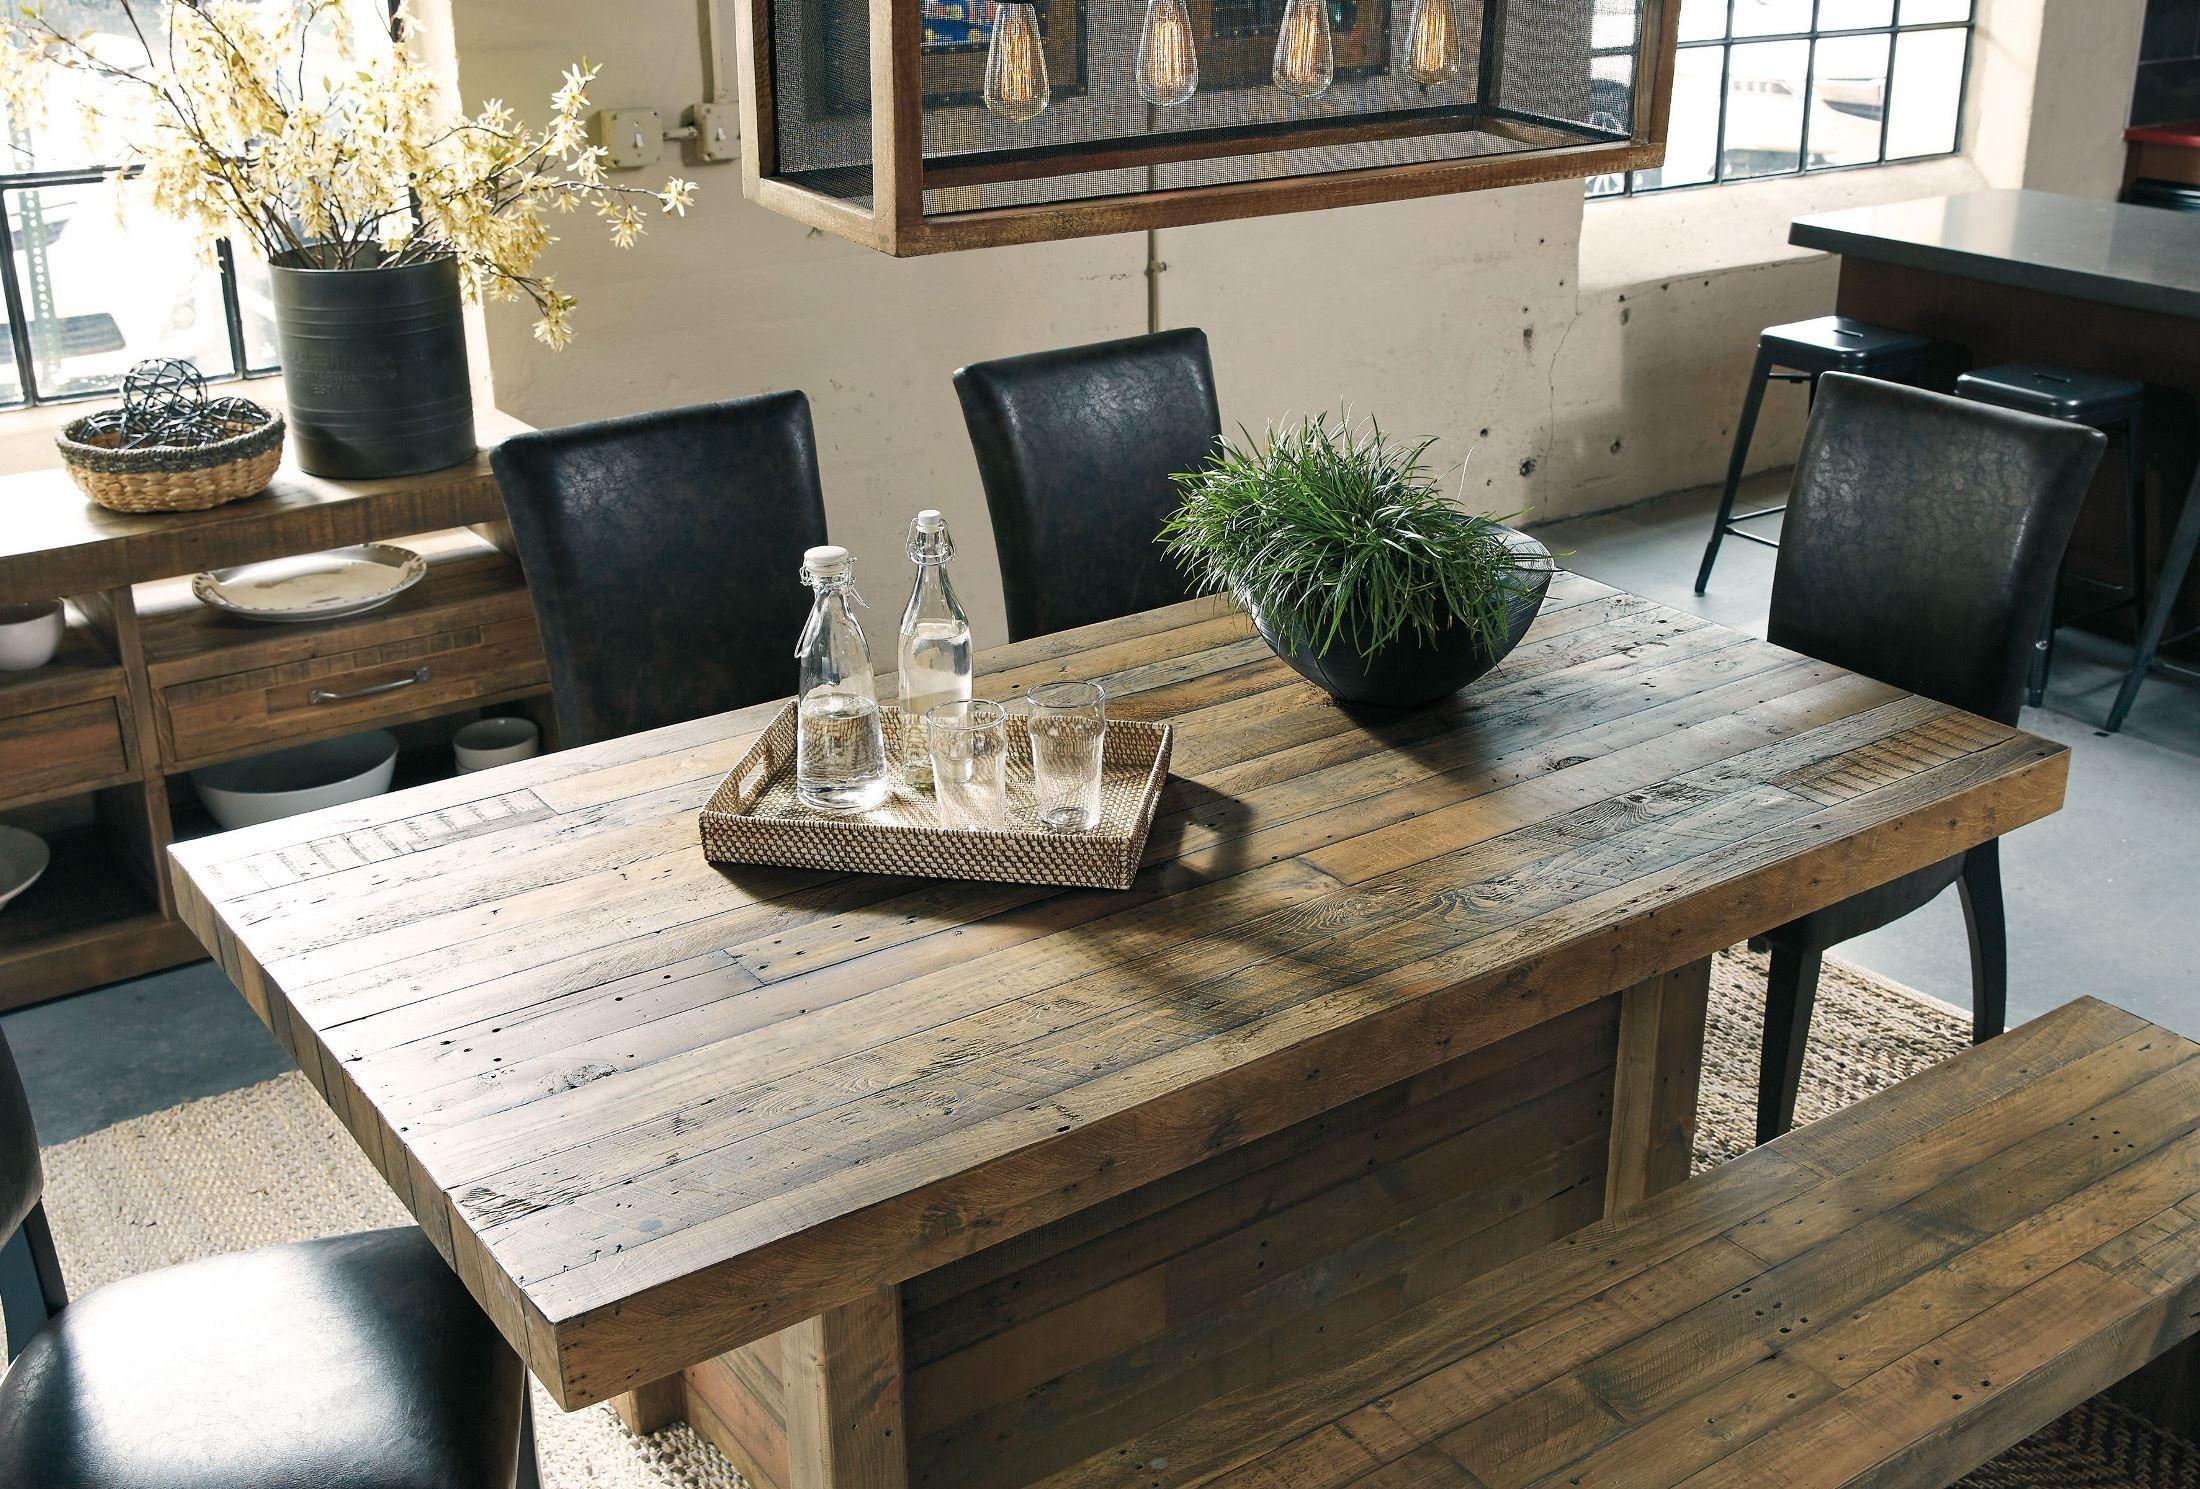 Sommerford Brown Rectangular Dining Room Set From Ashley